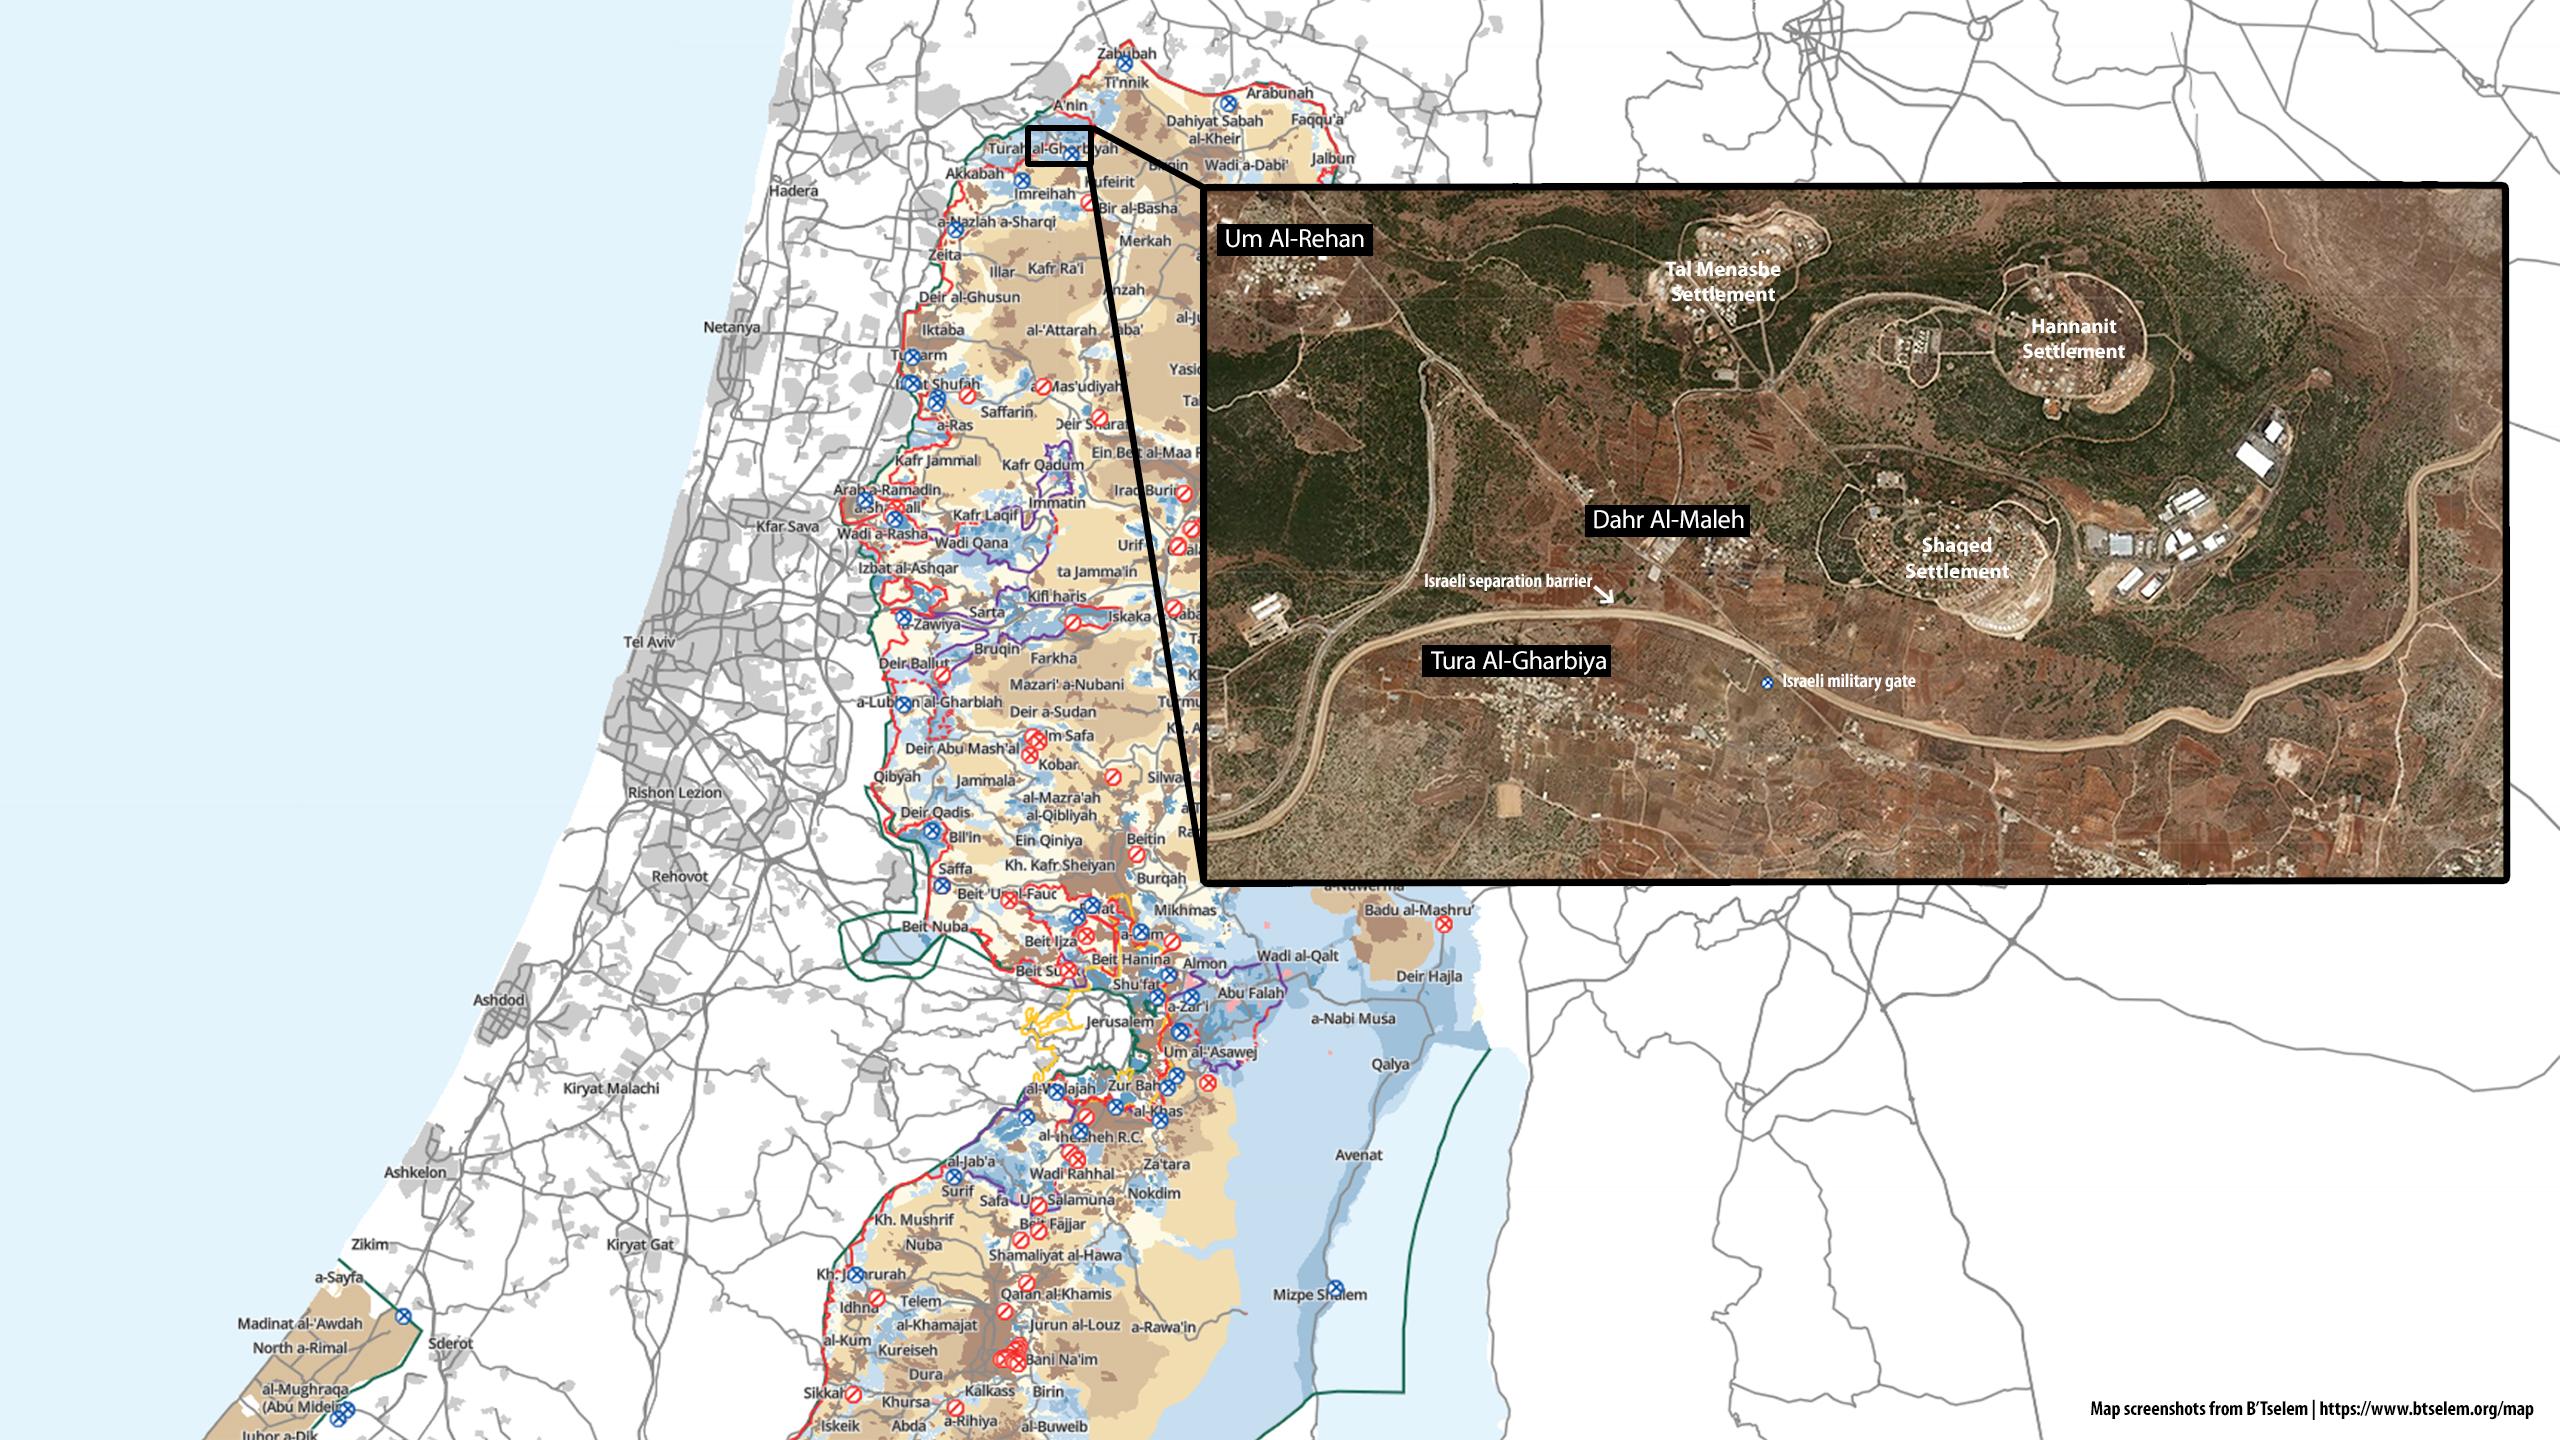 Map depicting location of Dahr Al-Maleh, the Israeli separation barrier, military gate, and Tura Al-Gharbiya village. Screenshots: B'Tselem interactive map